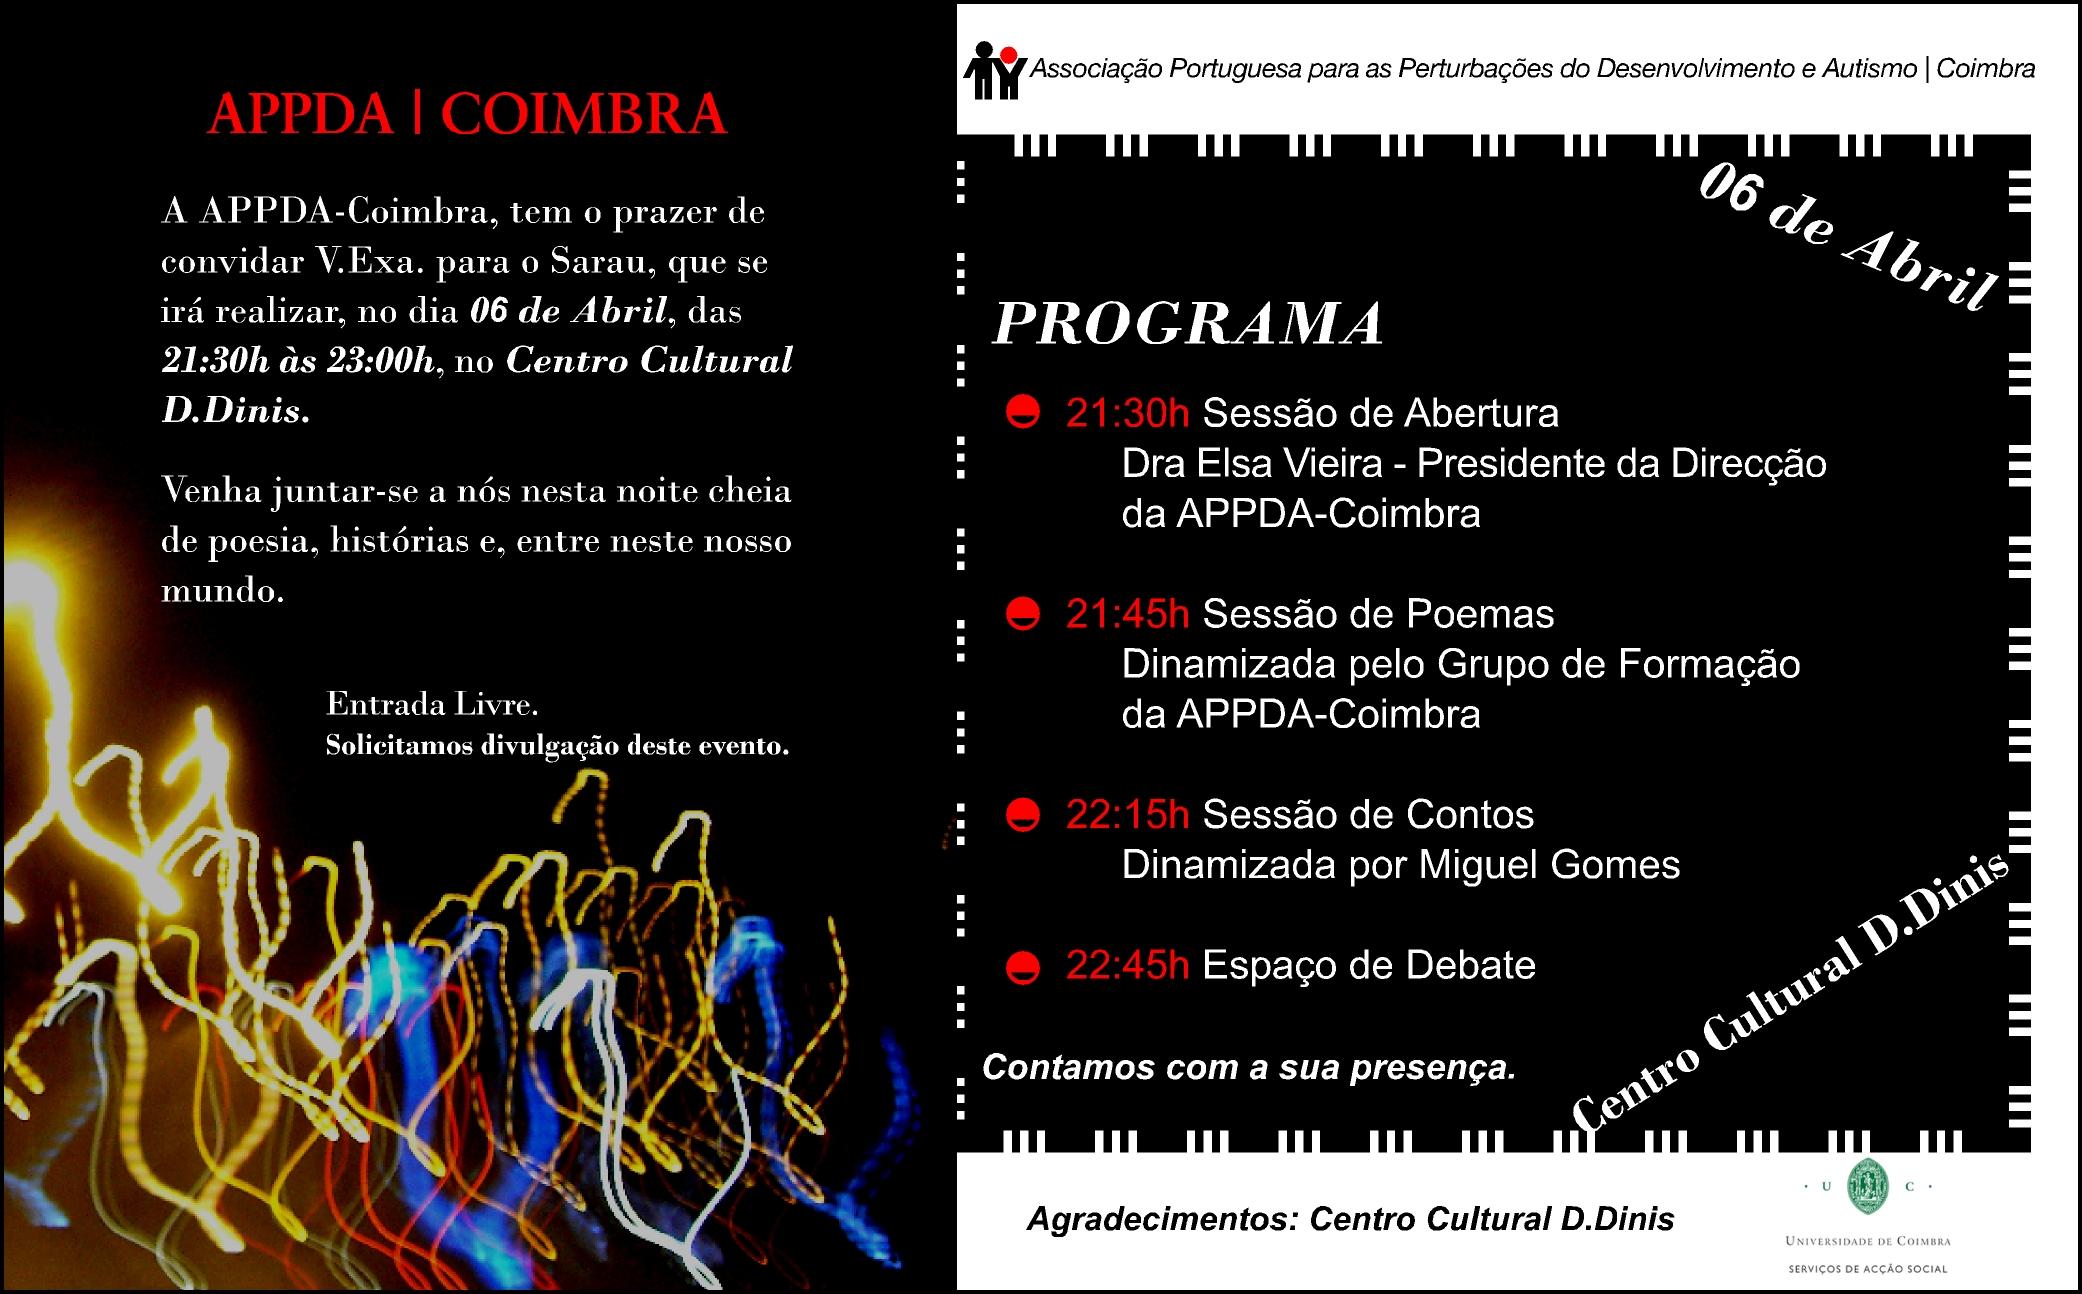 publicidade_D.dinis (2).jpg